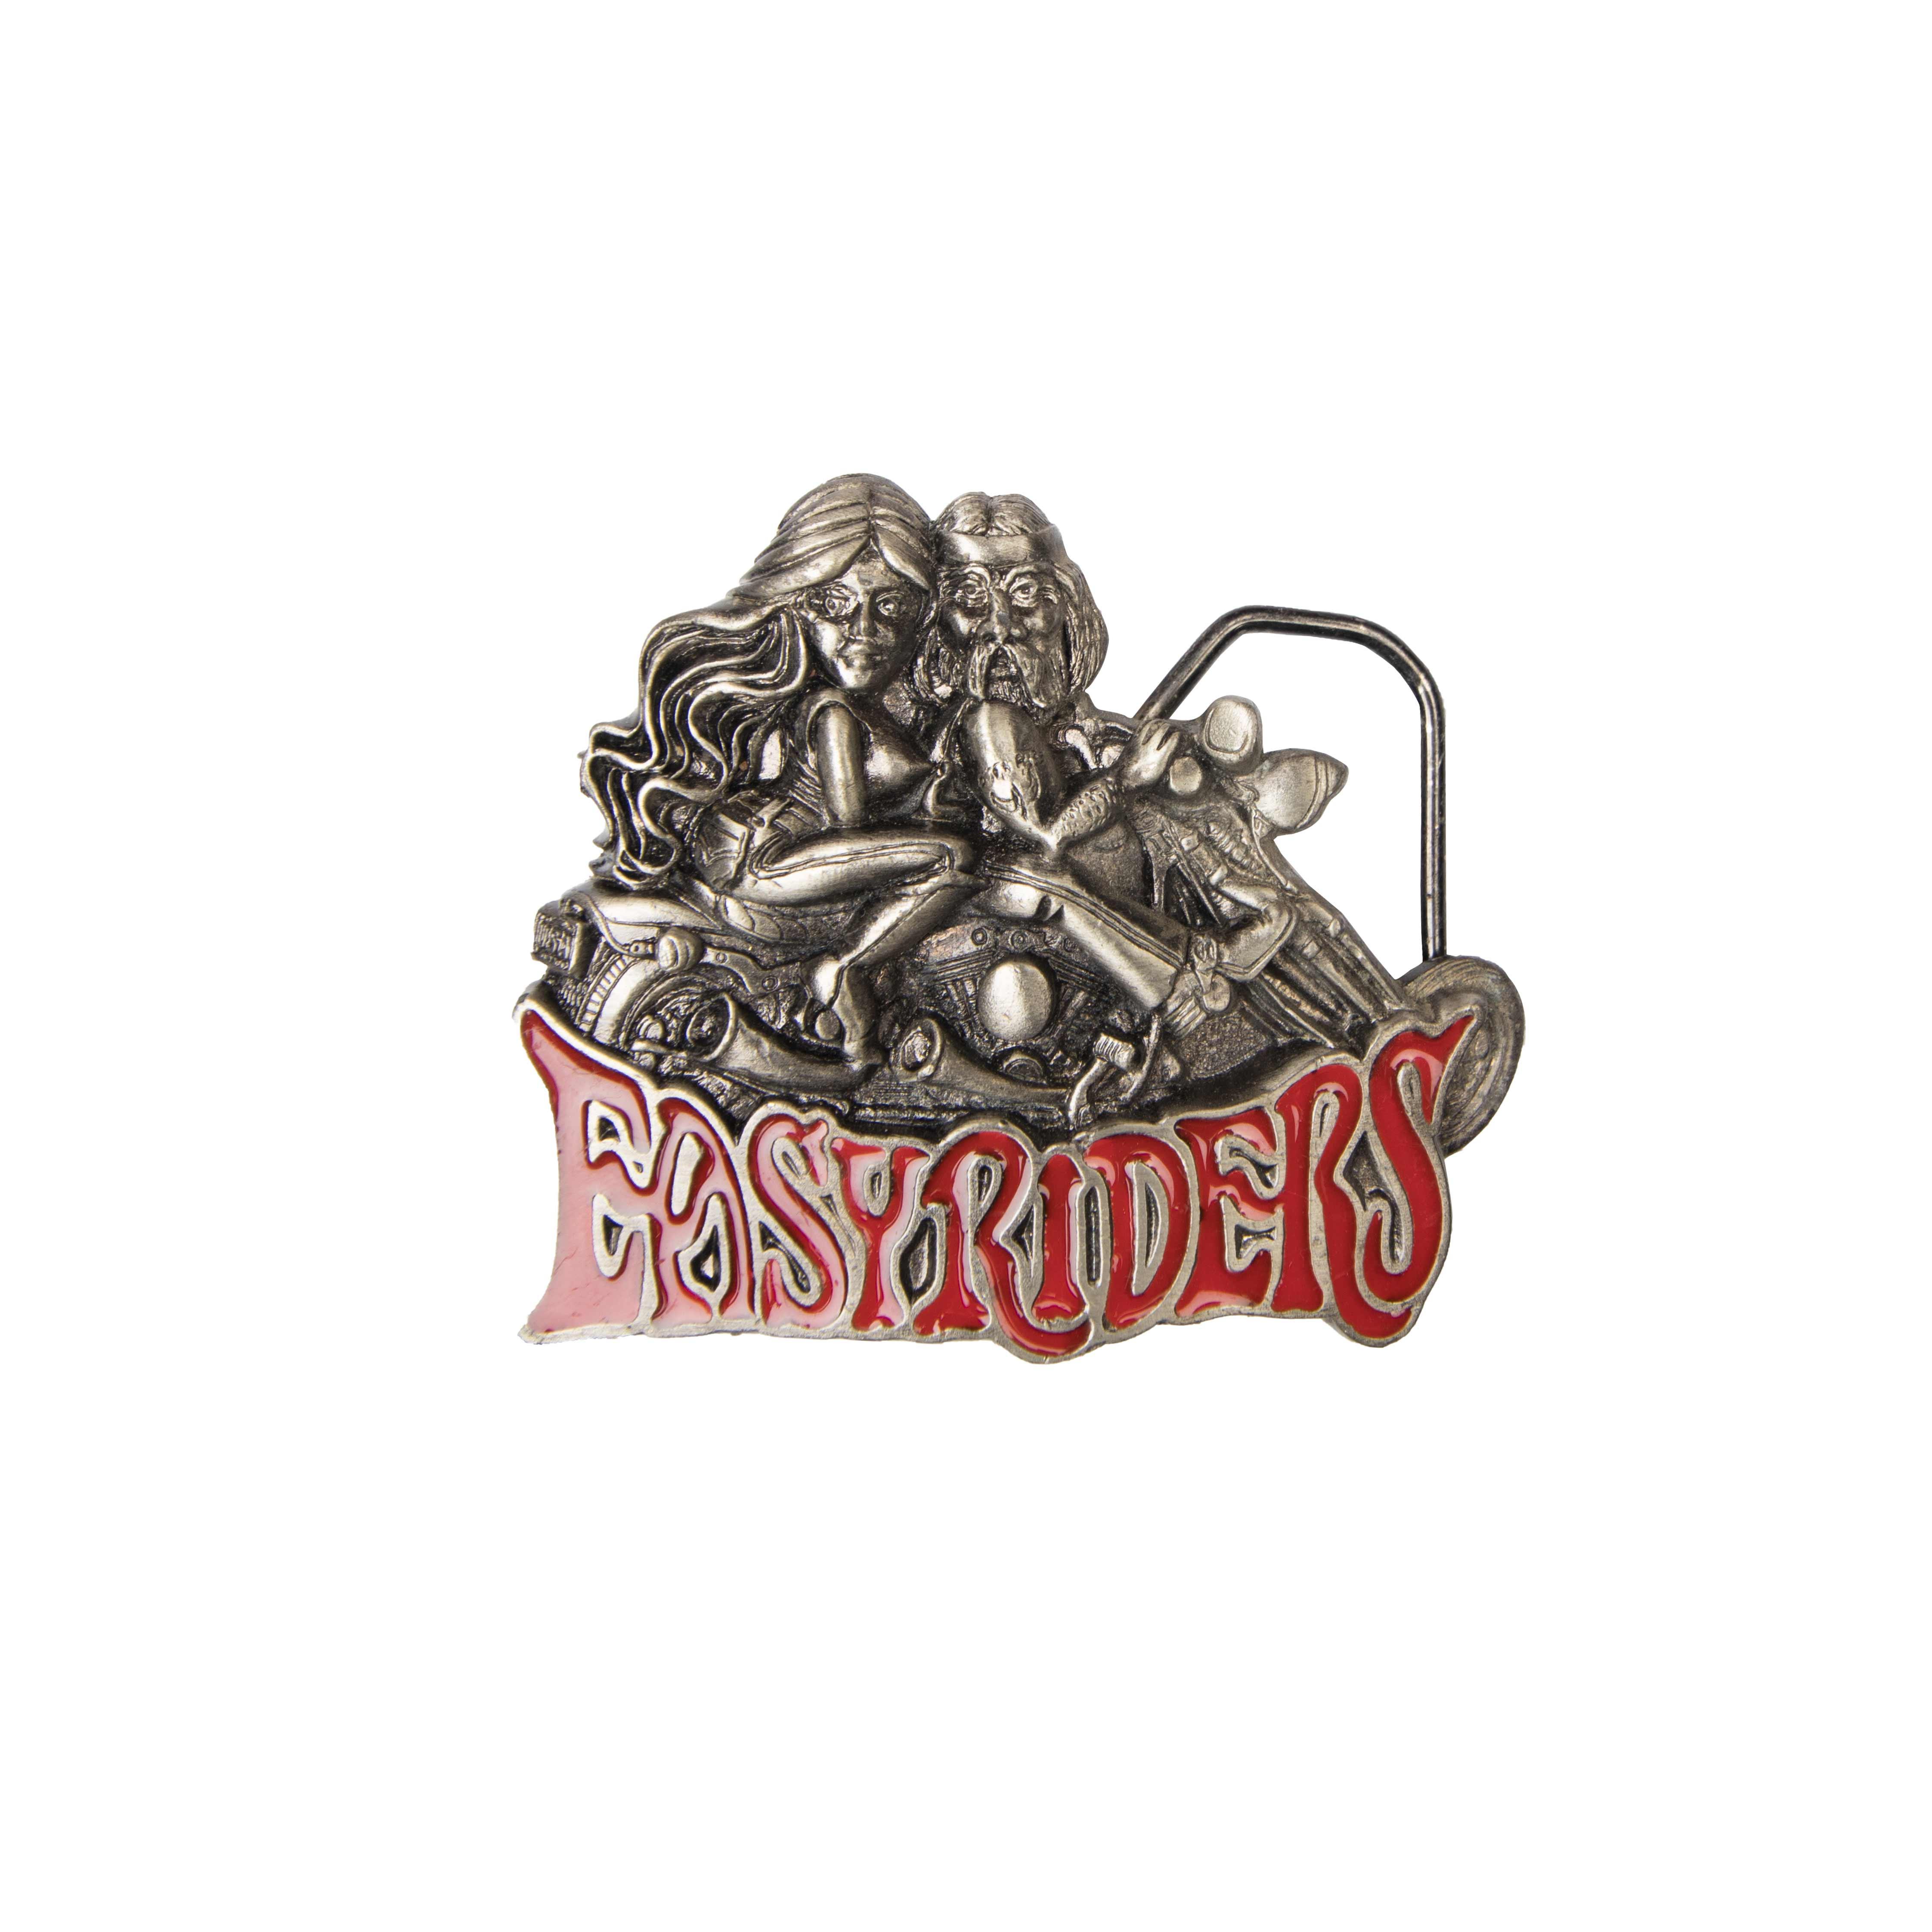 Biker Easy Riders Buckle 2074